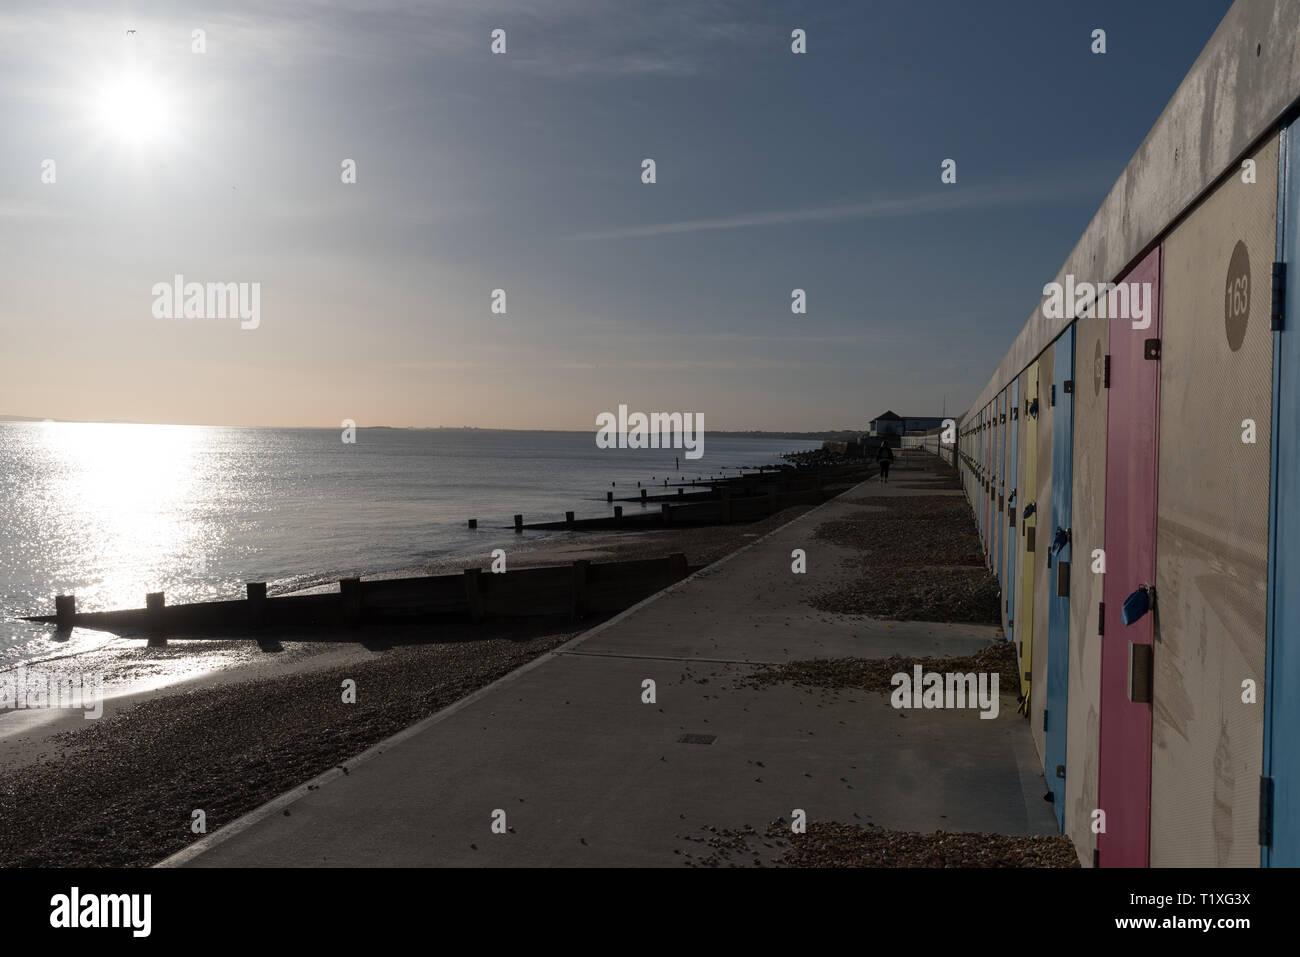 Milford on sea hampshire seaside beach - Stock Image